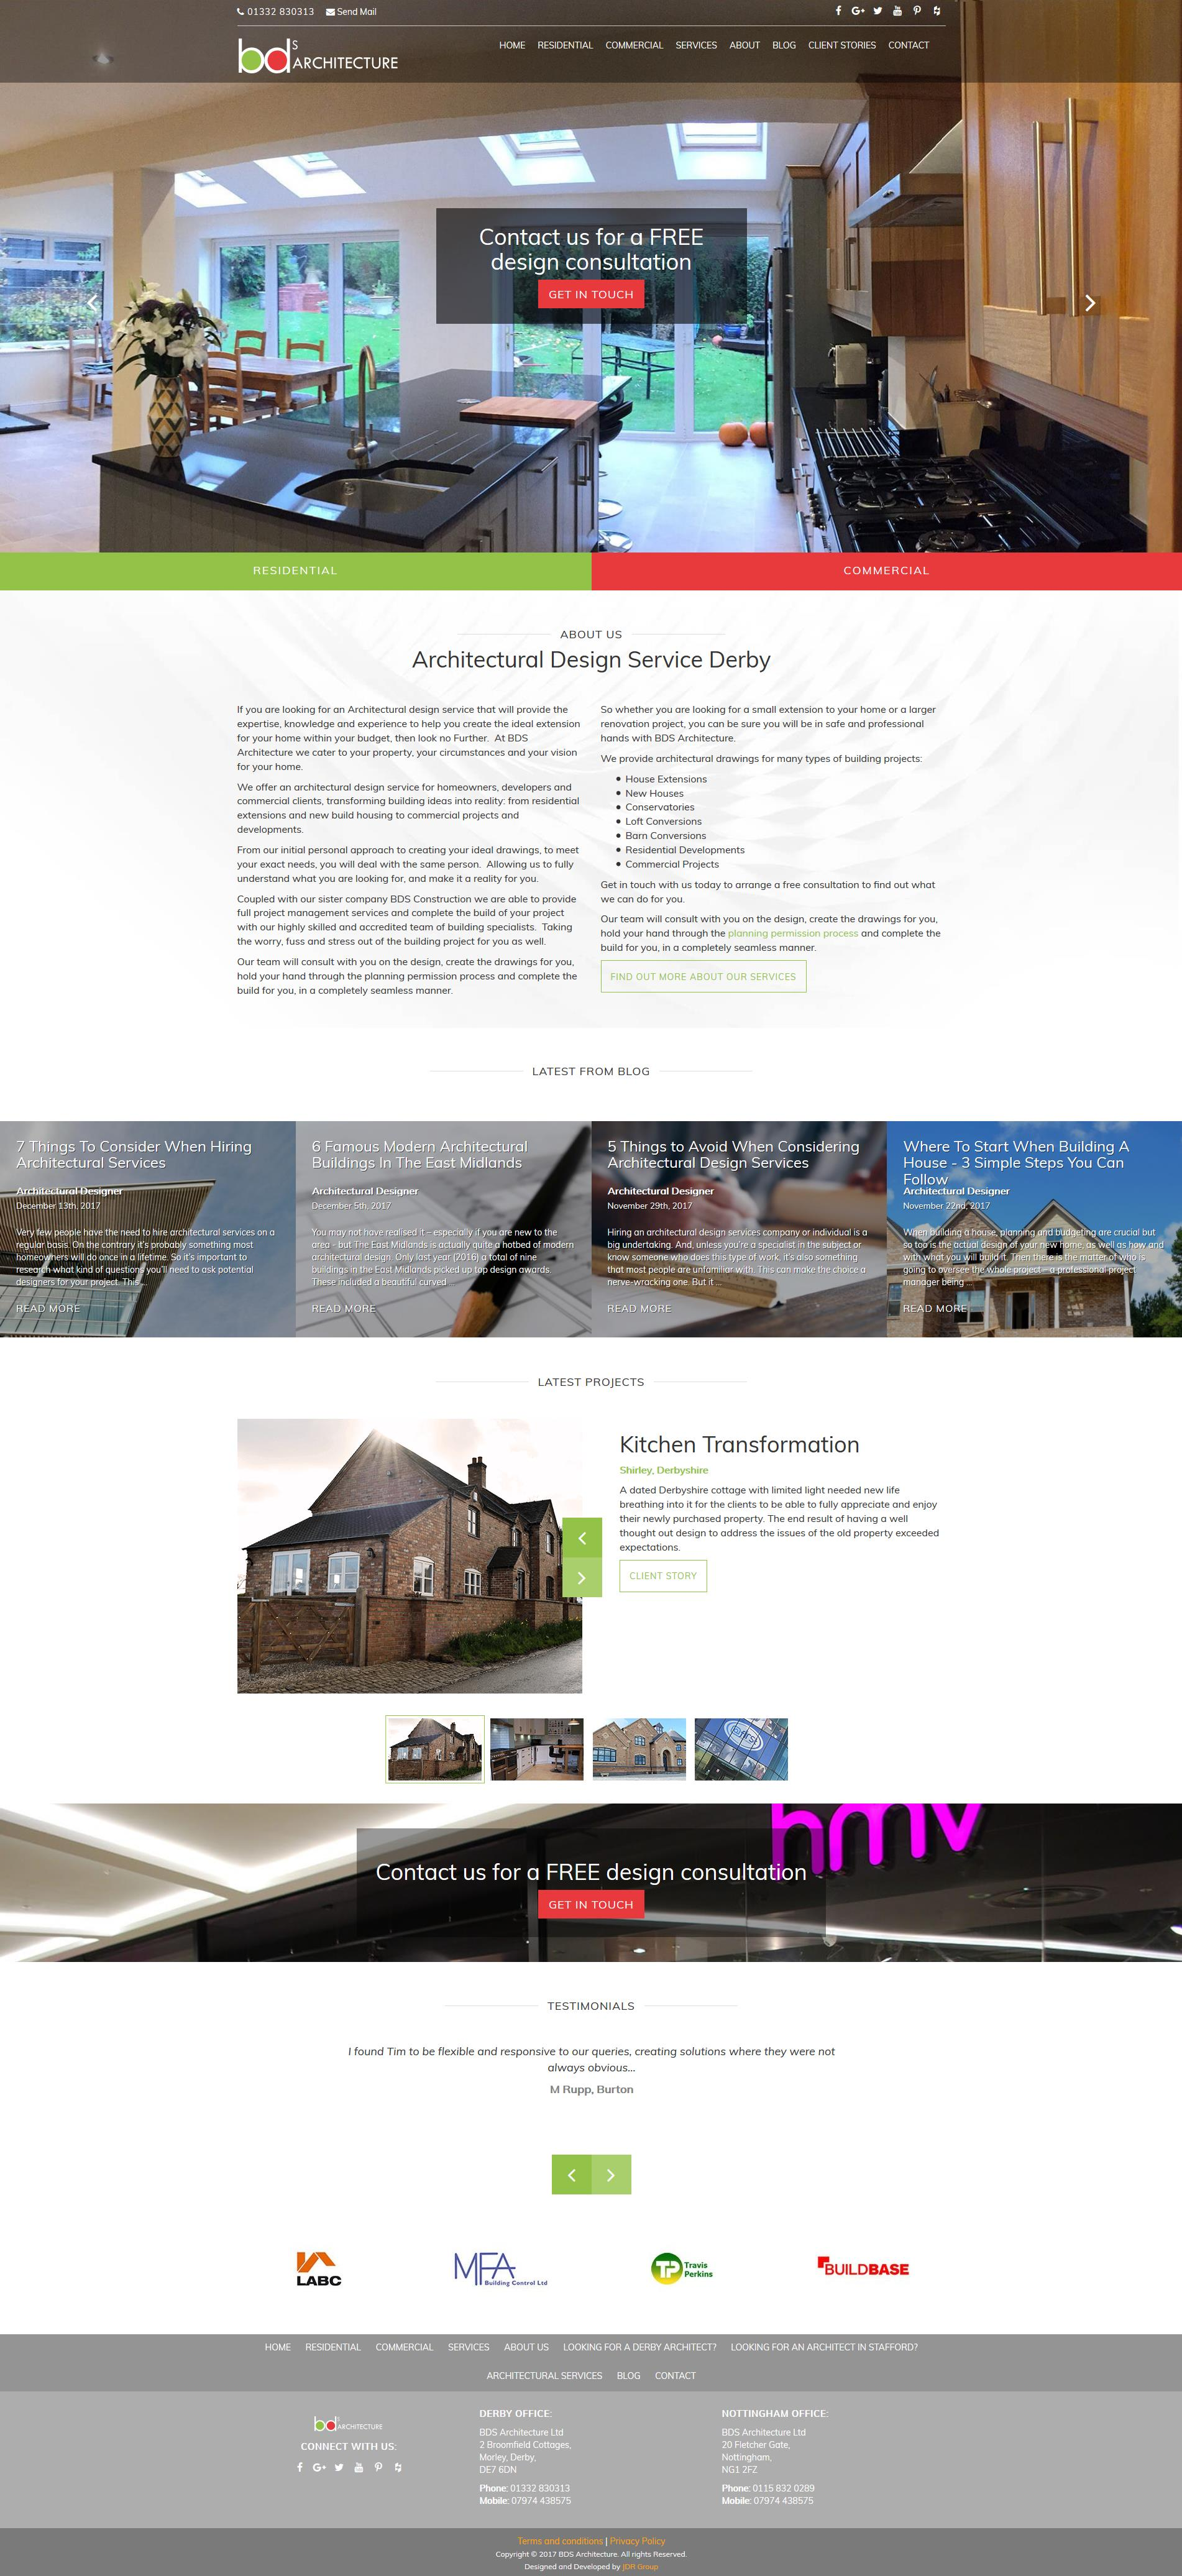 Article Img design.jpg